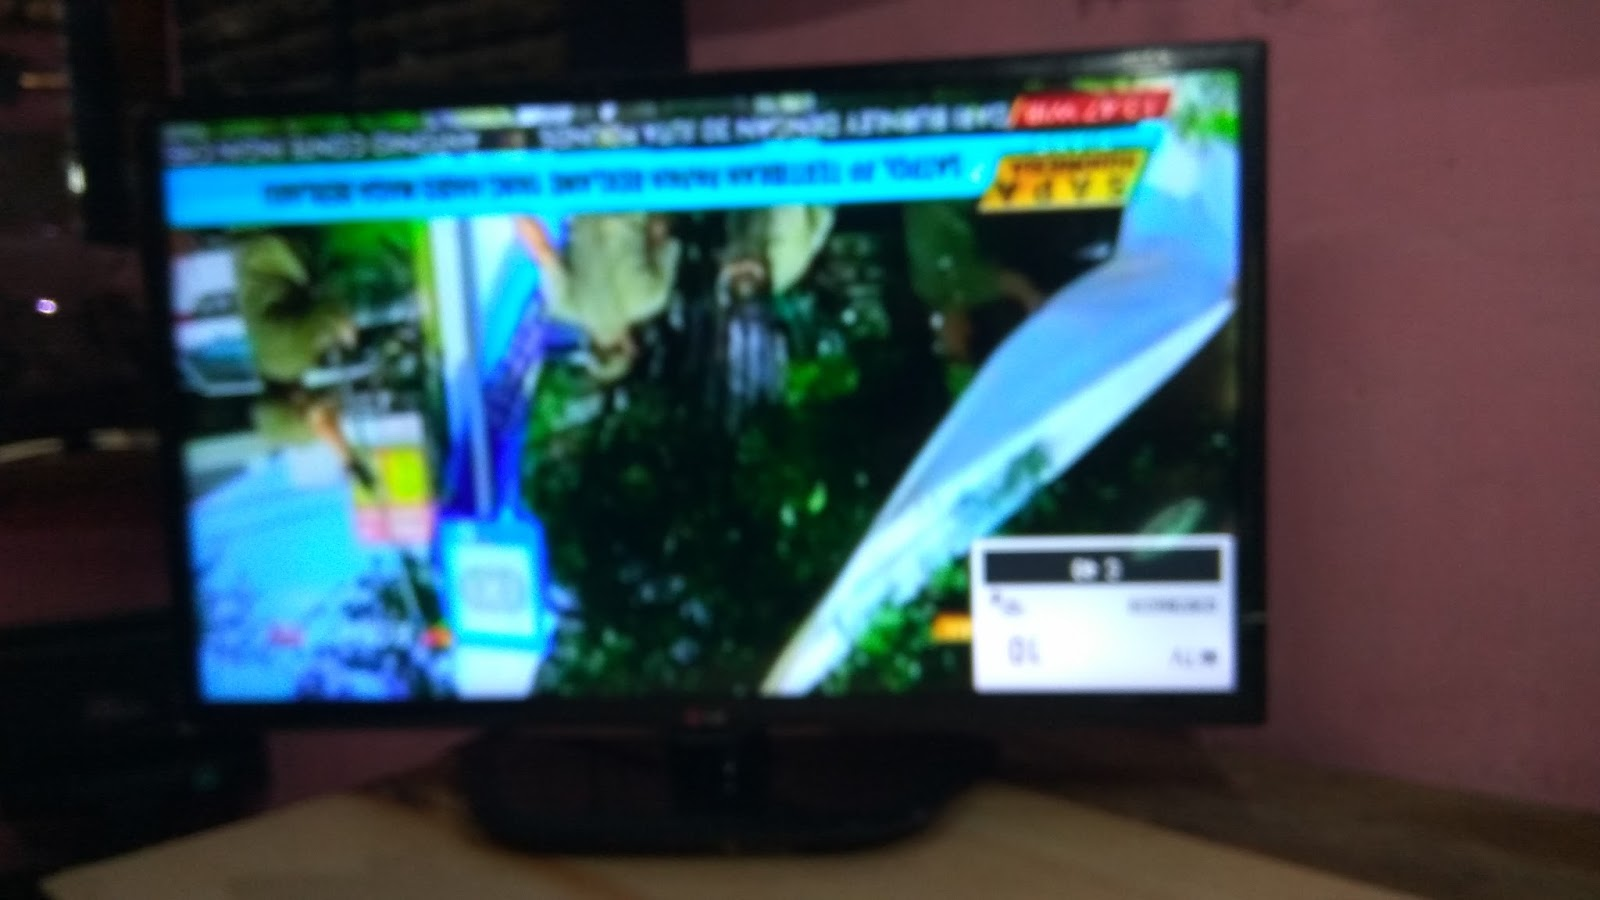 Solder Pecebeq: TV LG 32LN5100 / 32LB530A GAMBAR TERBALIK